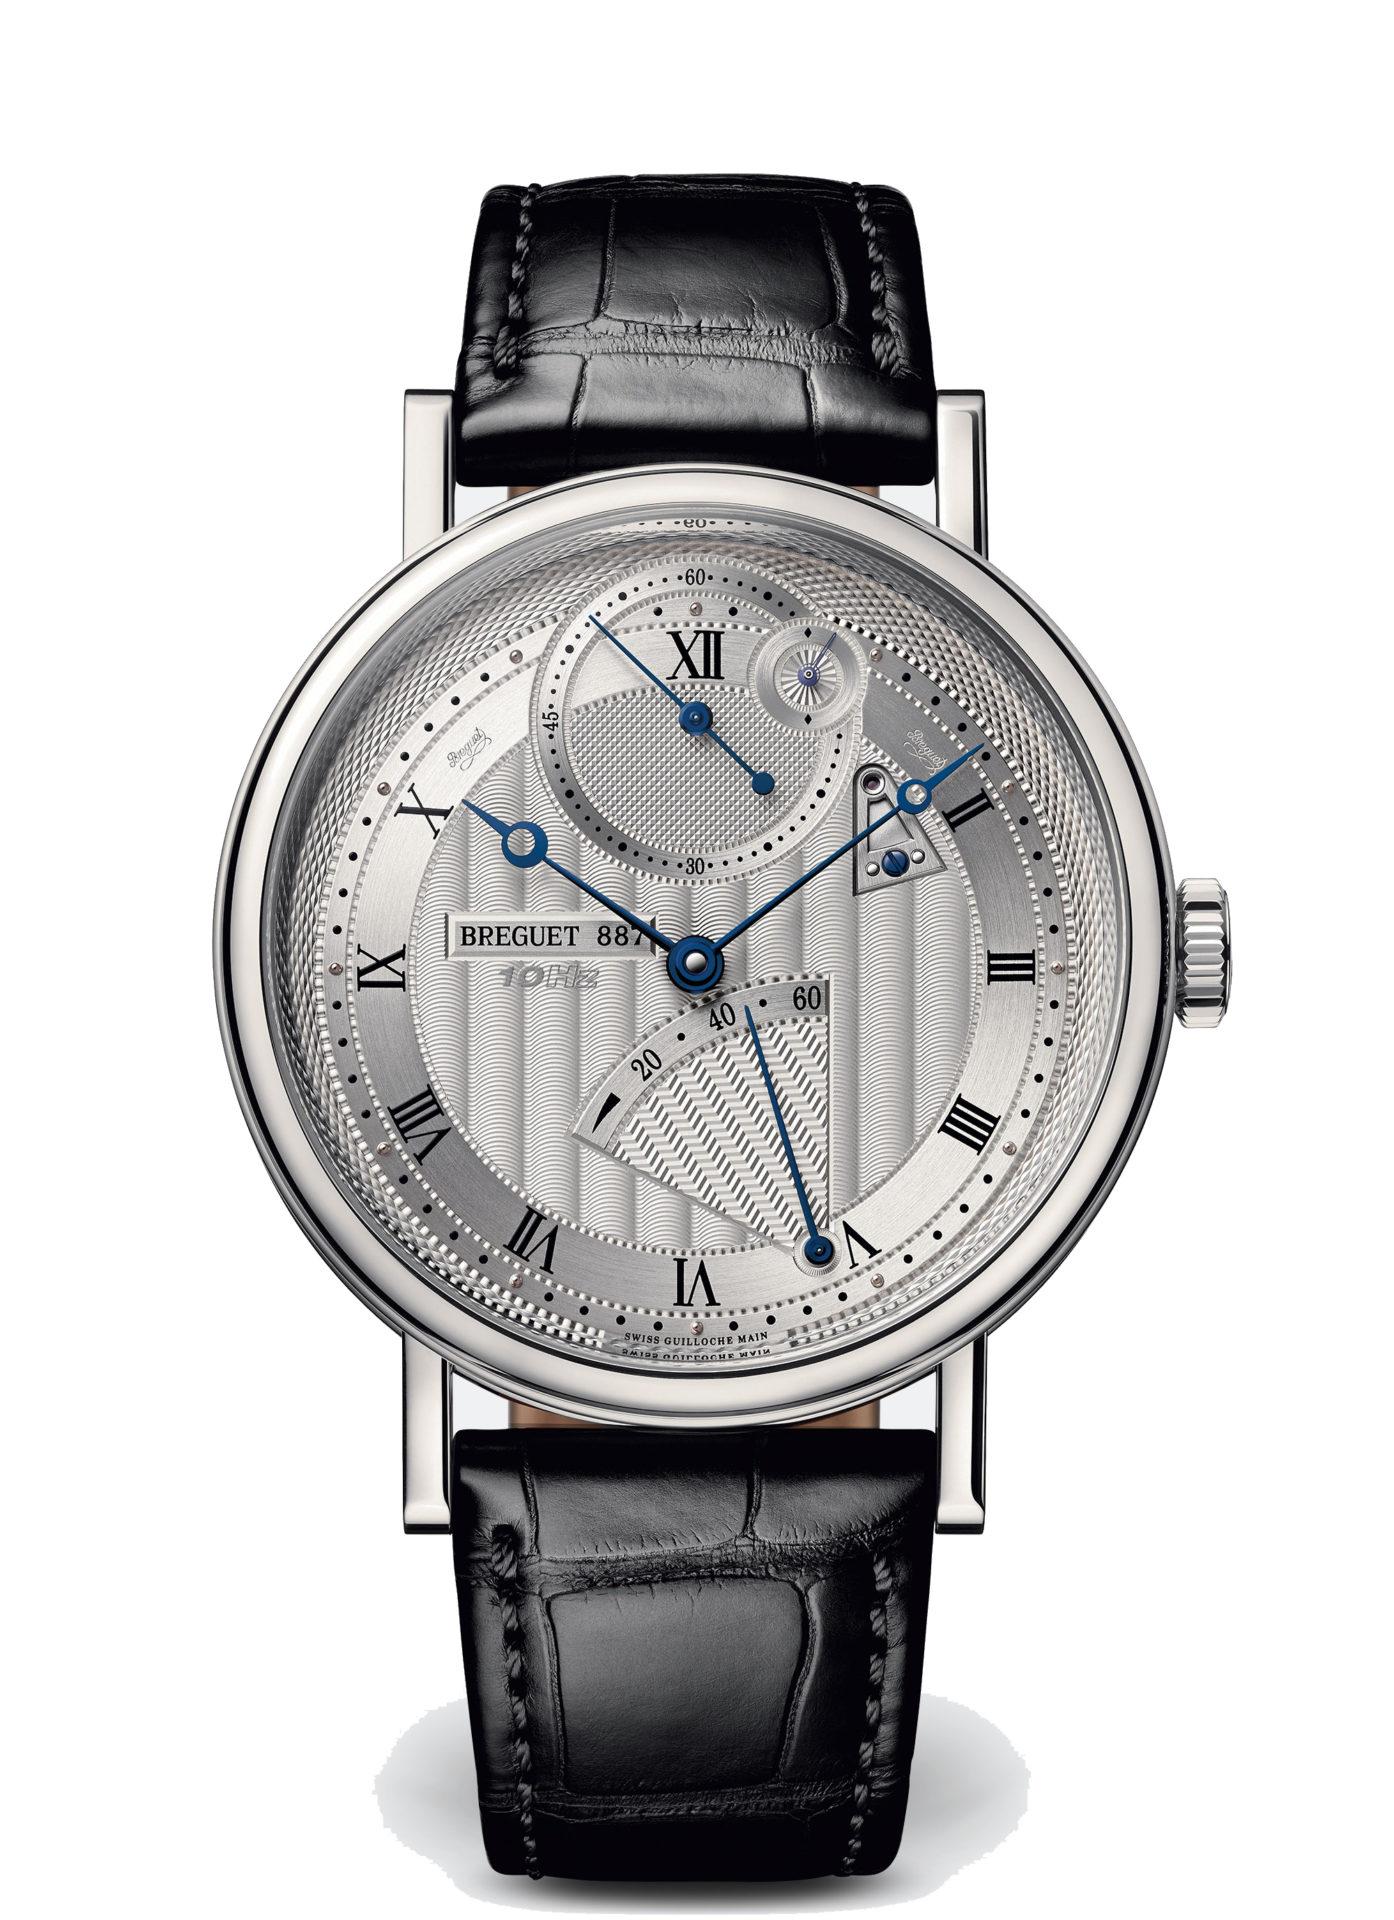 Breguet-Classique-Chronométrie-7727-Hall-of-Time-7727bb-12-9wu